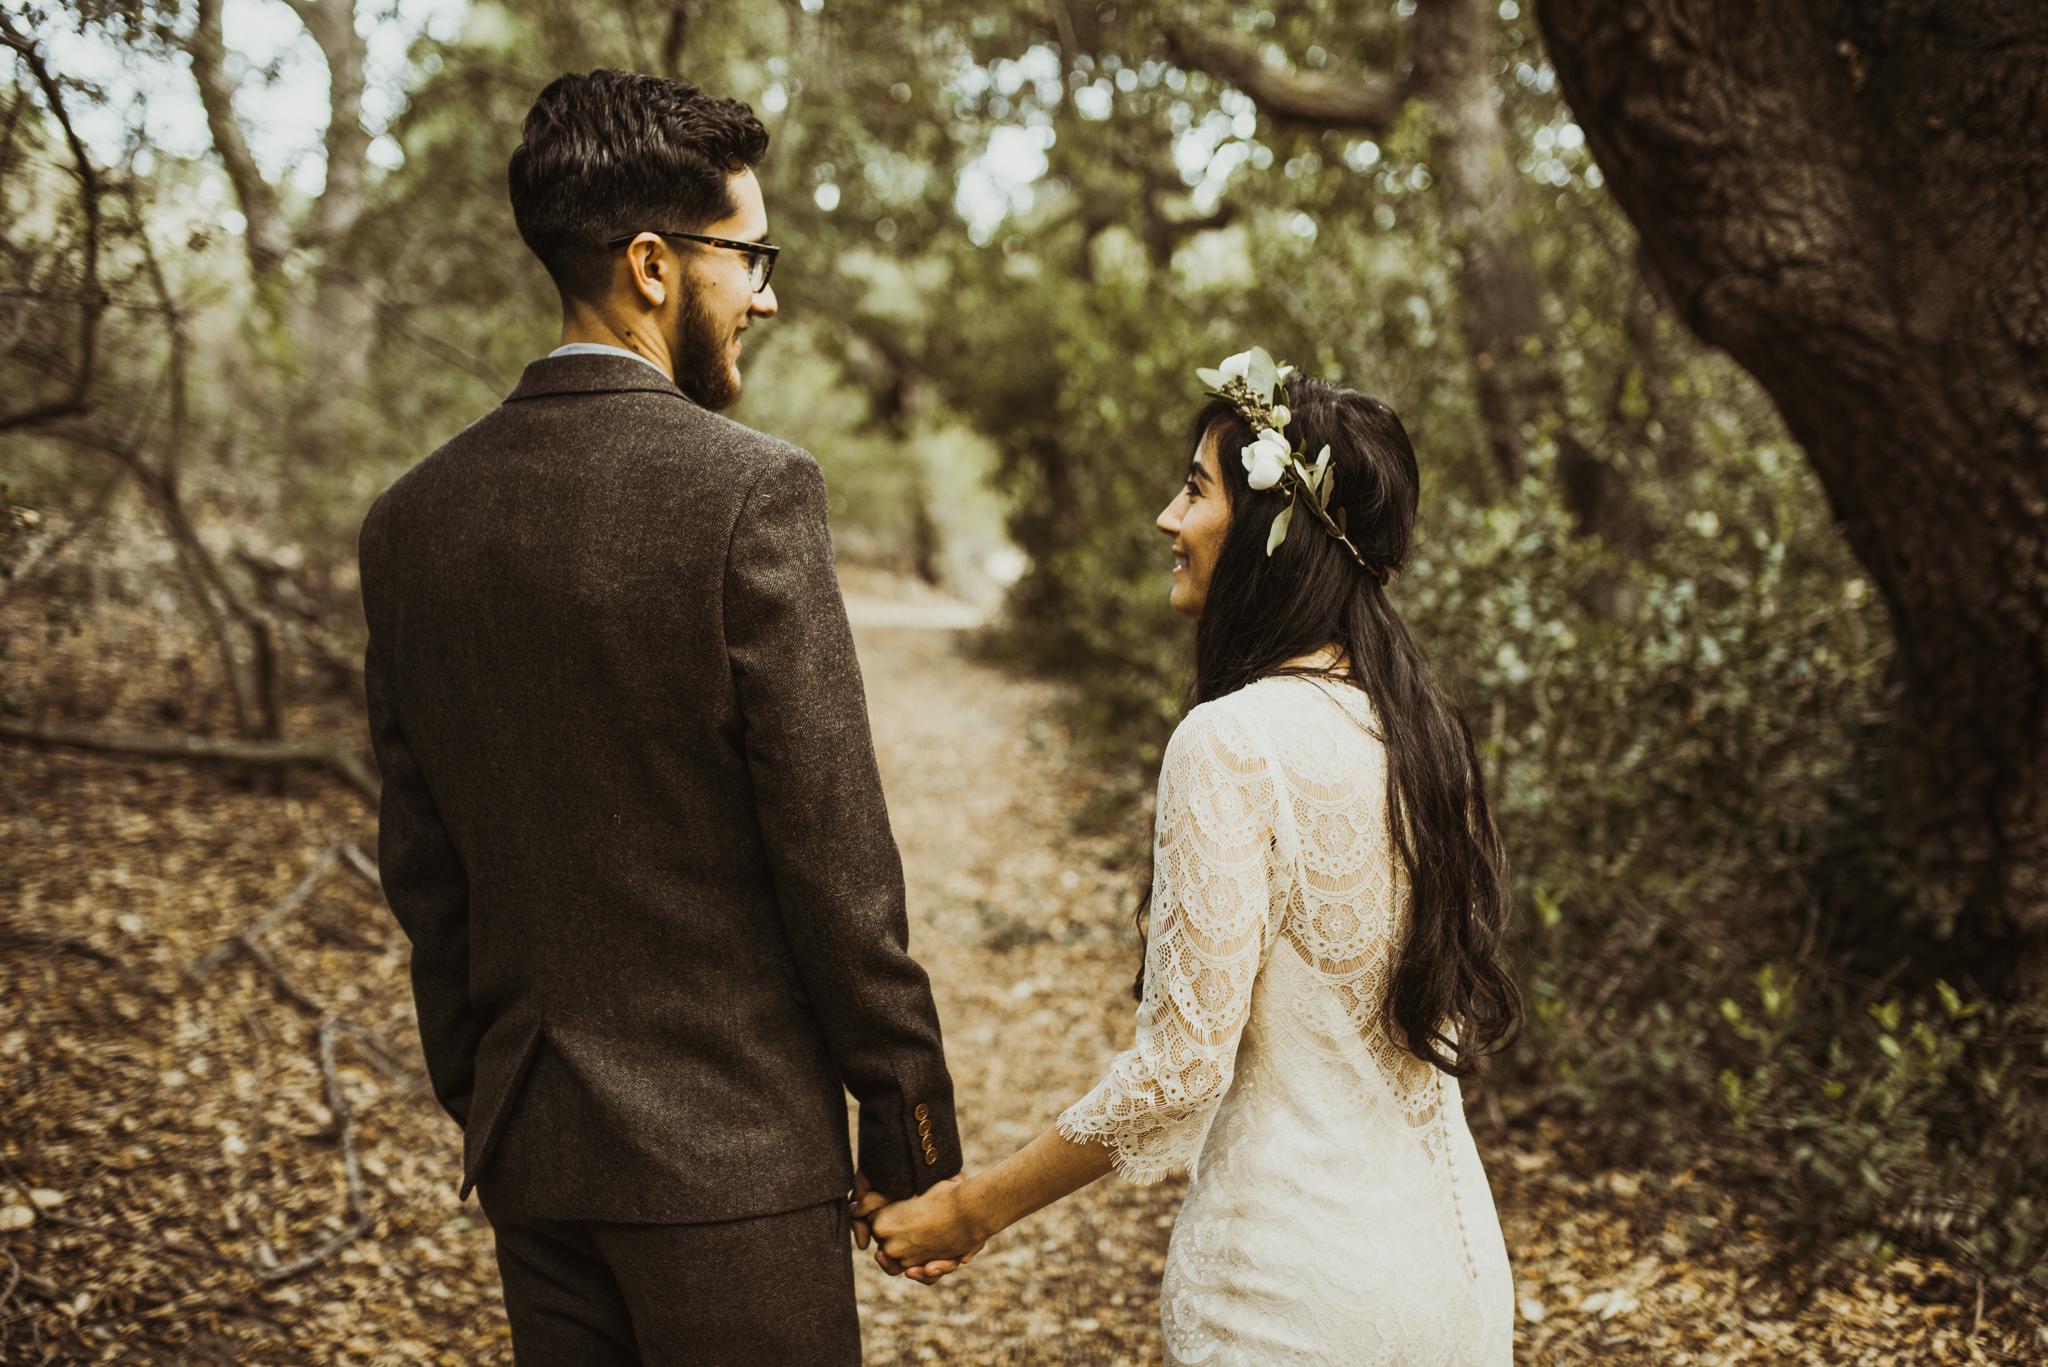 ©Isaiah-&-Taylor-Photography---Oak-Canyon-Nature-Center-Wedding,-Anaheim-Hills-022.jpg